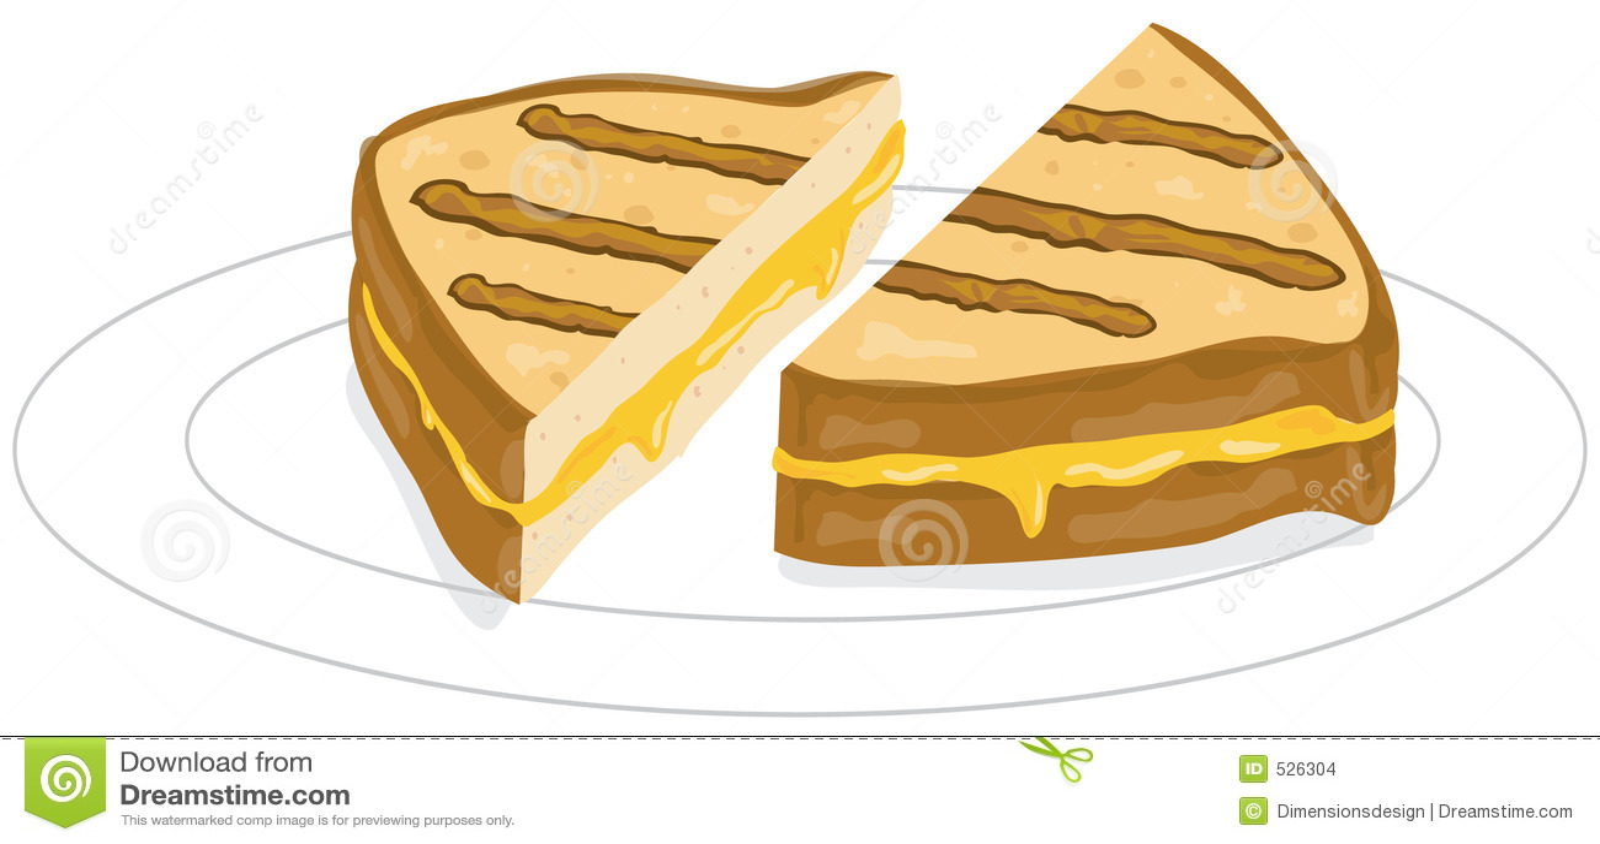 Download 干酪烤了 库存例证. 插画 包括有 快餐, 牌照, 切达乳酪, 一半, 制动手, 许多, 美味, 格栅, 干酪 - 526304